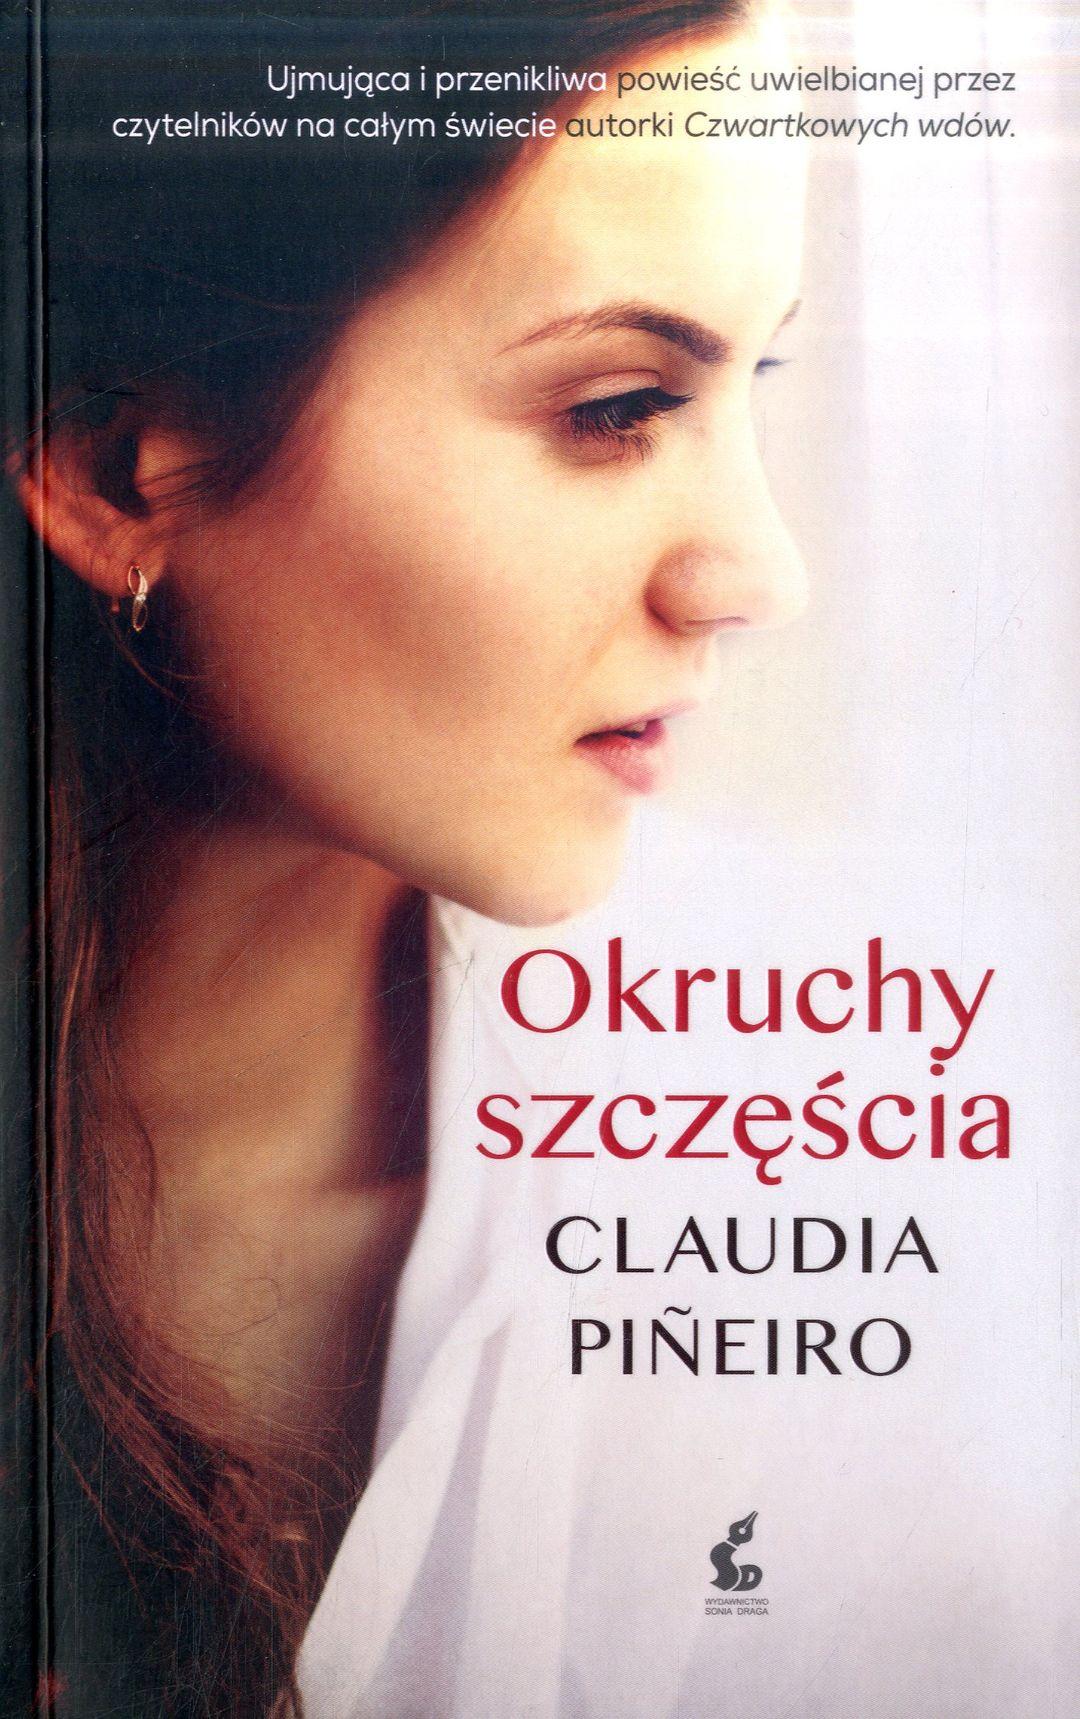 Pineiro Claudia Okruchy Szczescia